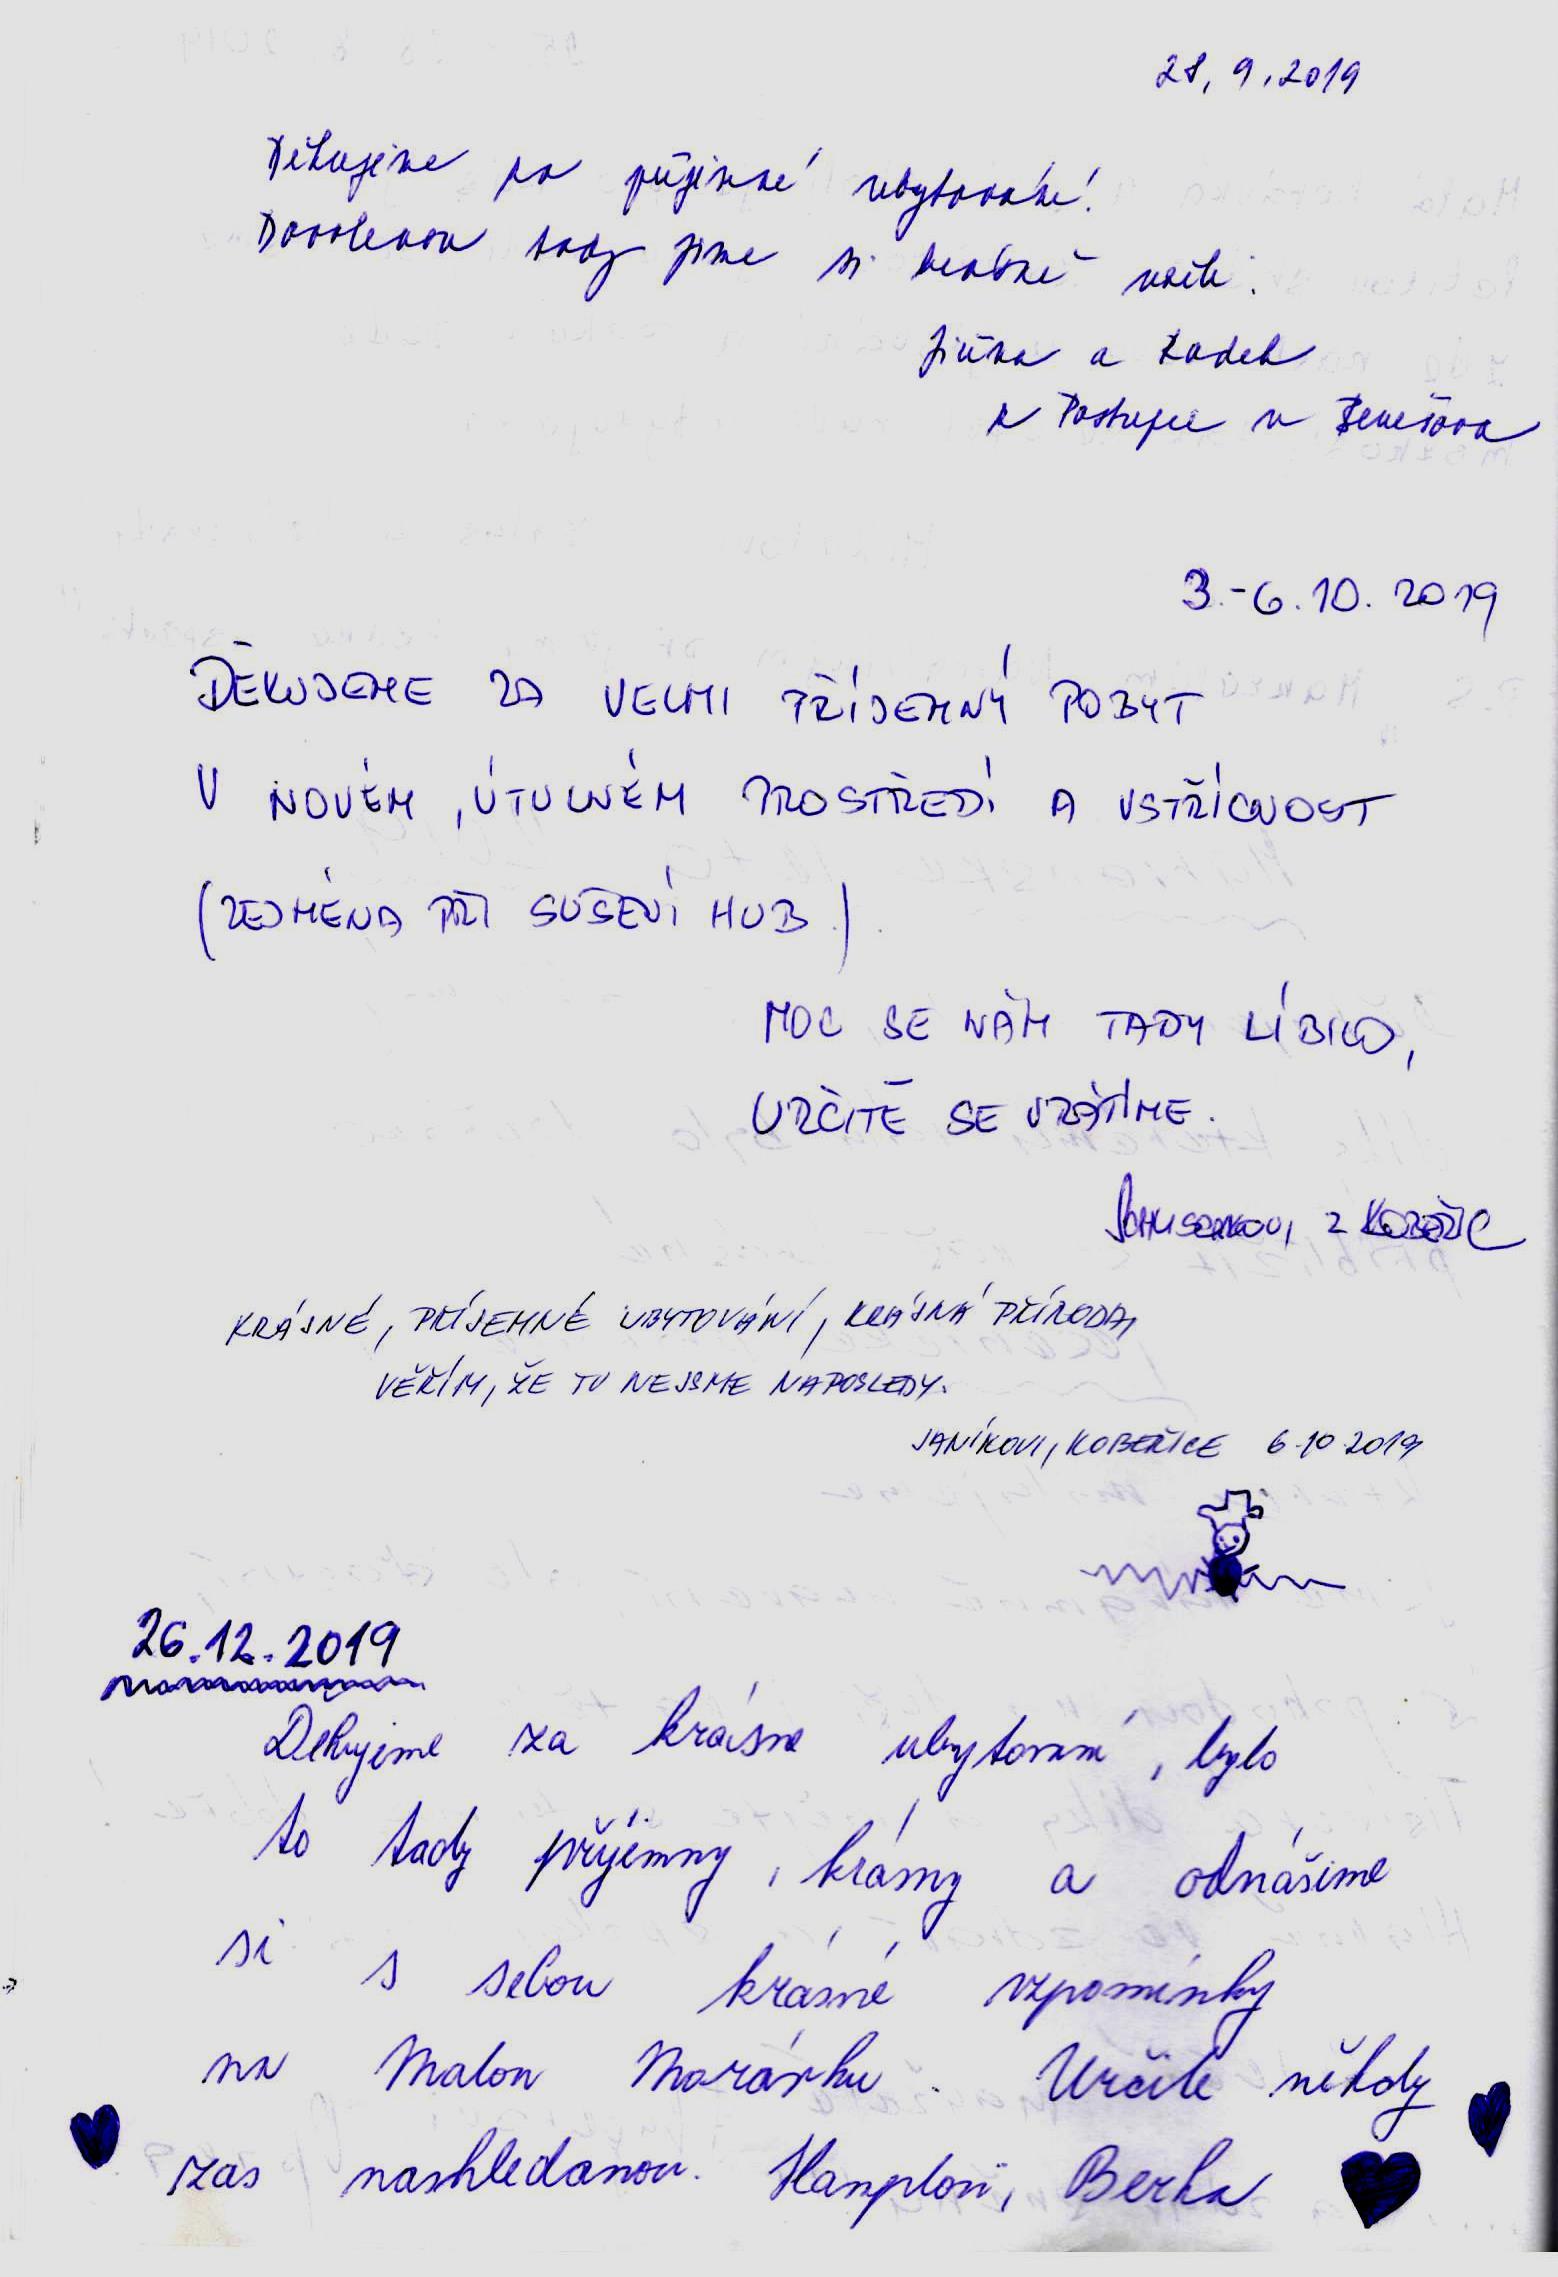 reference Moravka0001